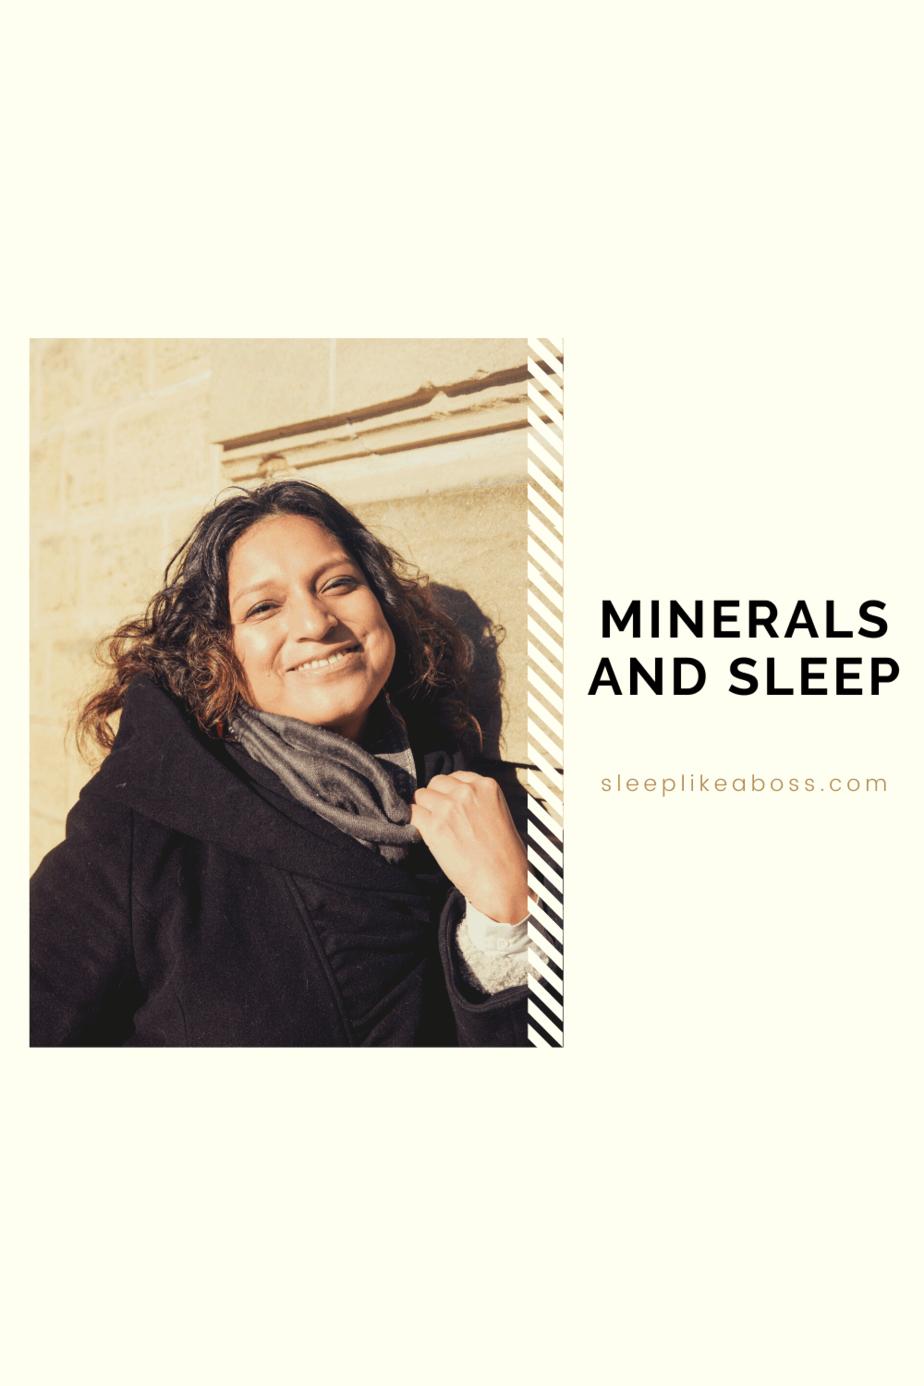 Minerals and sleep